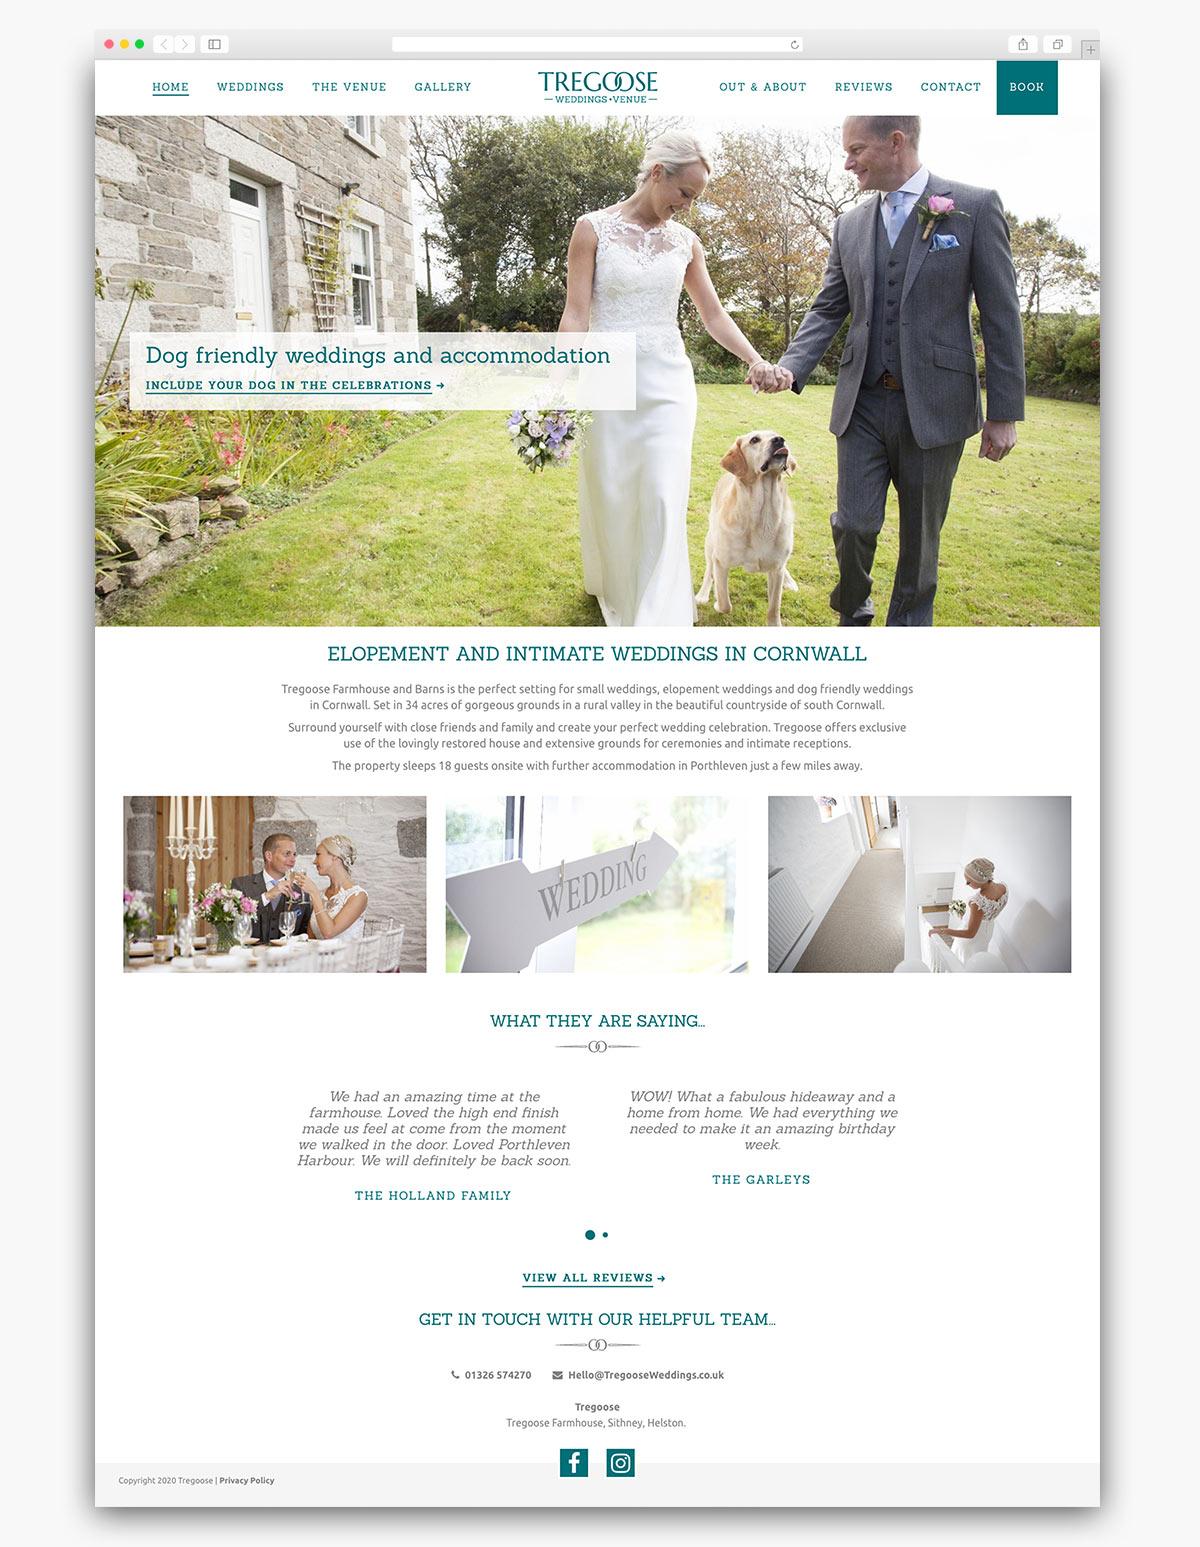 Tregoose Weddings Wordpress Website Design Homepage